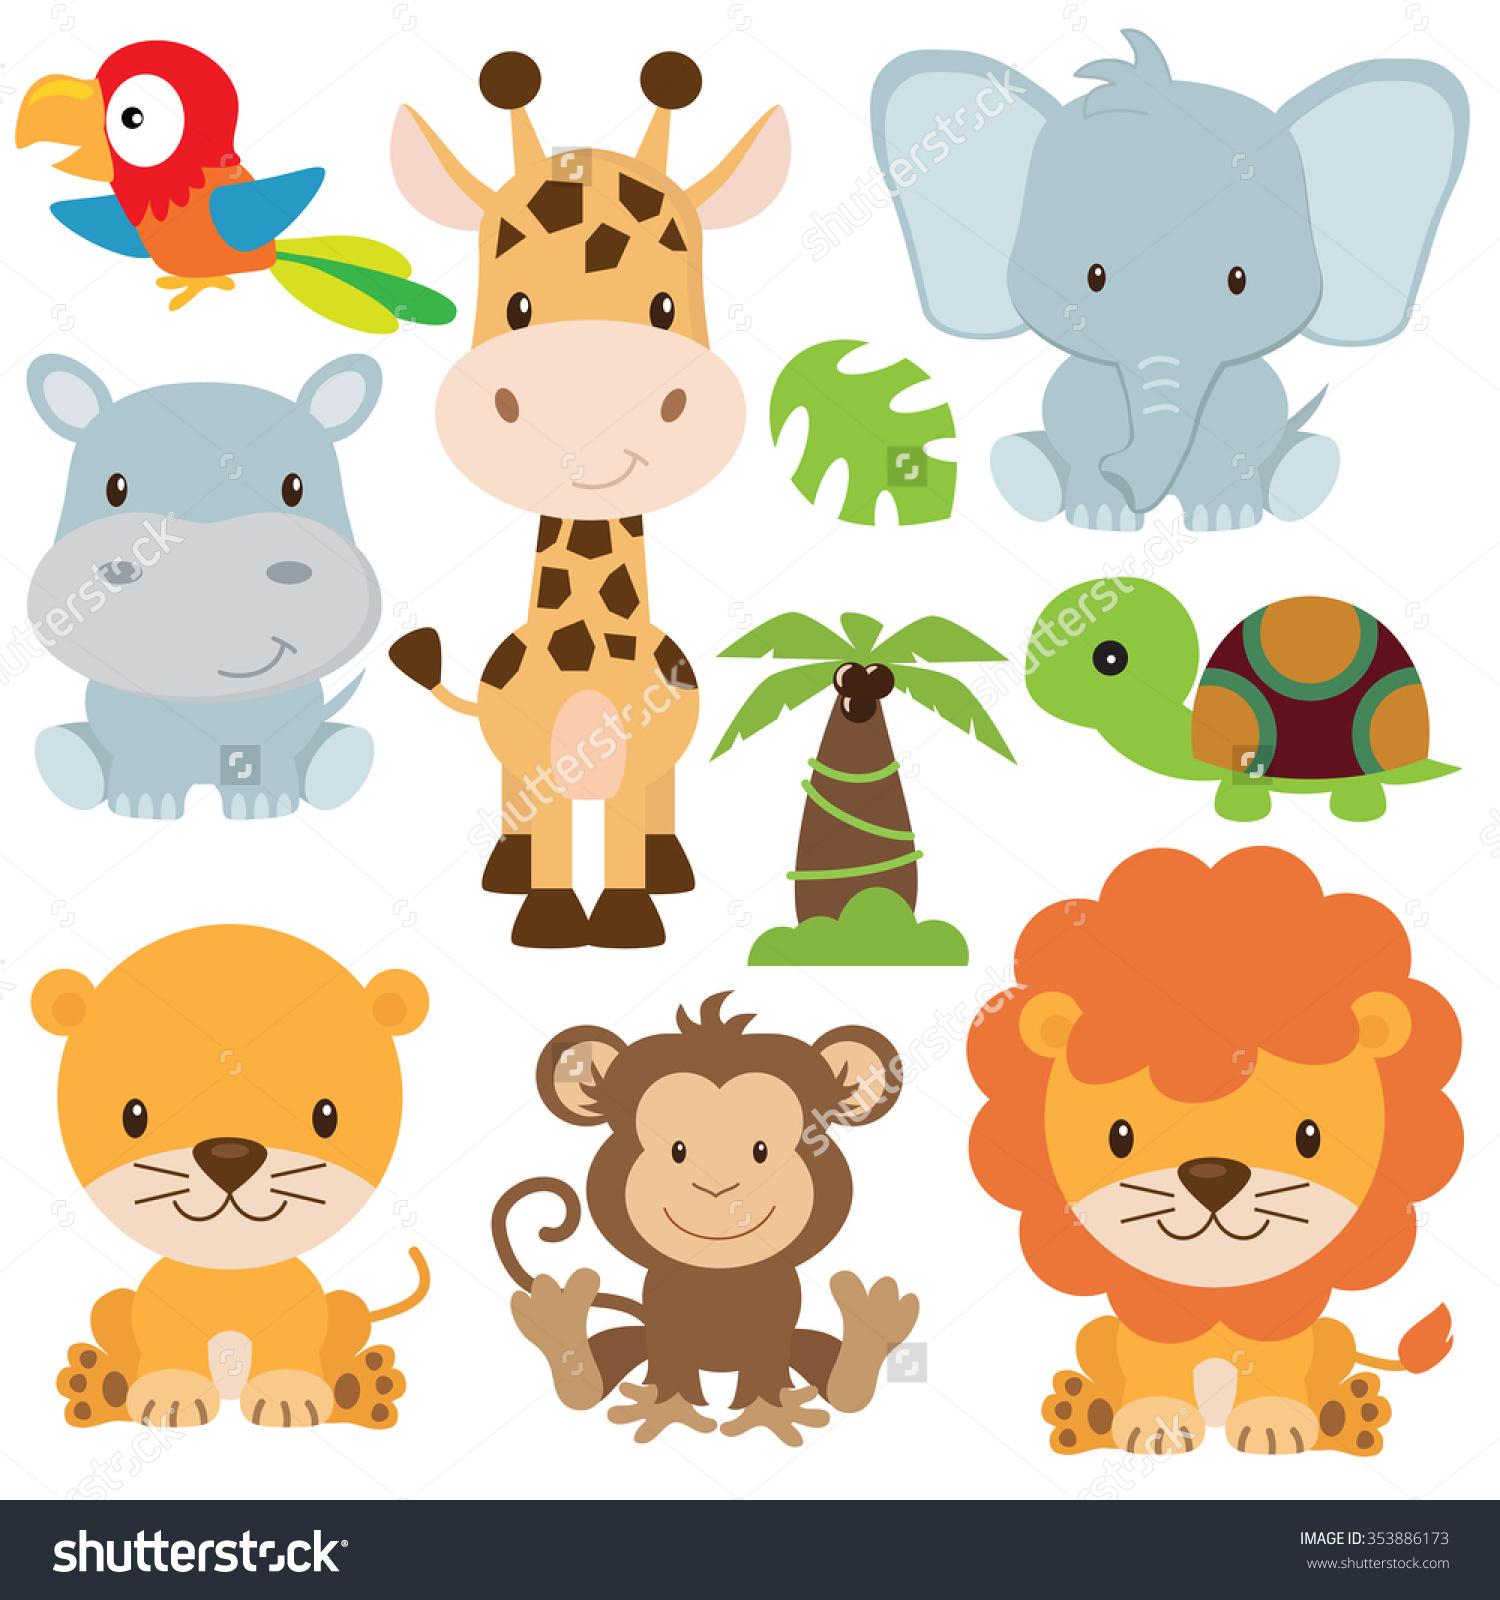 hight resolution of 1500x1600 jungle animals clipart vector cute animal safari lemonize